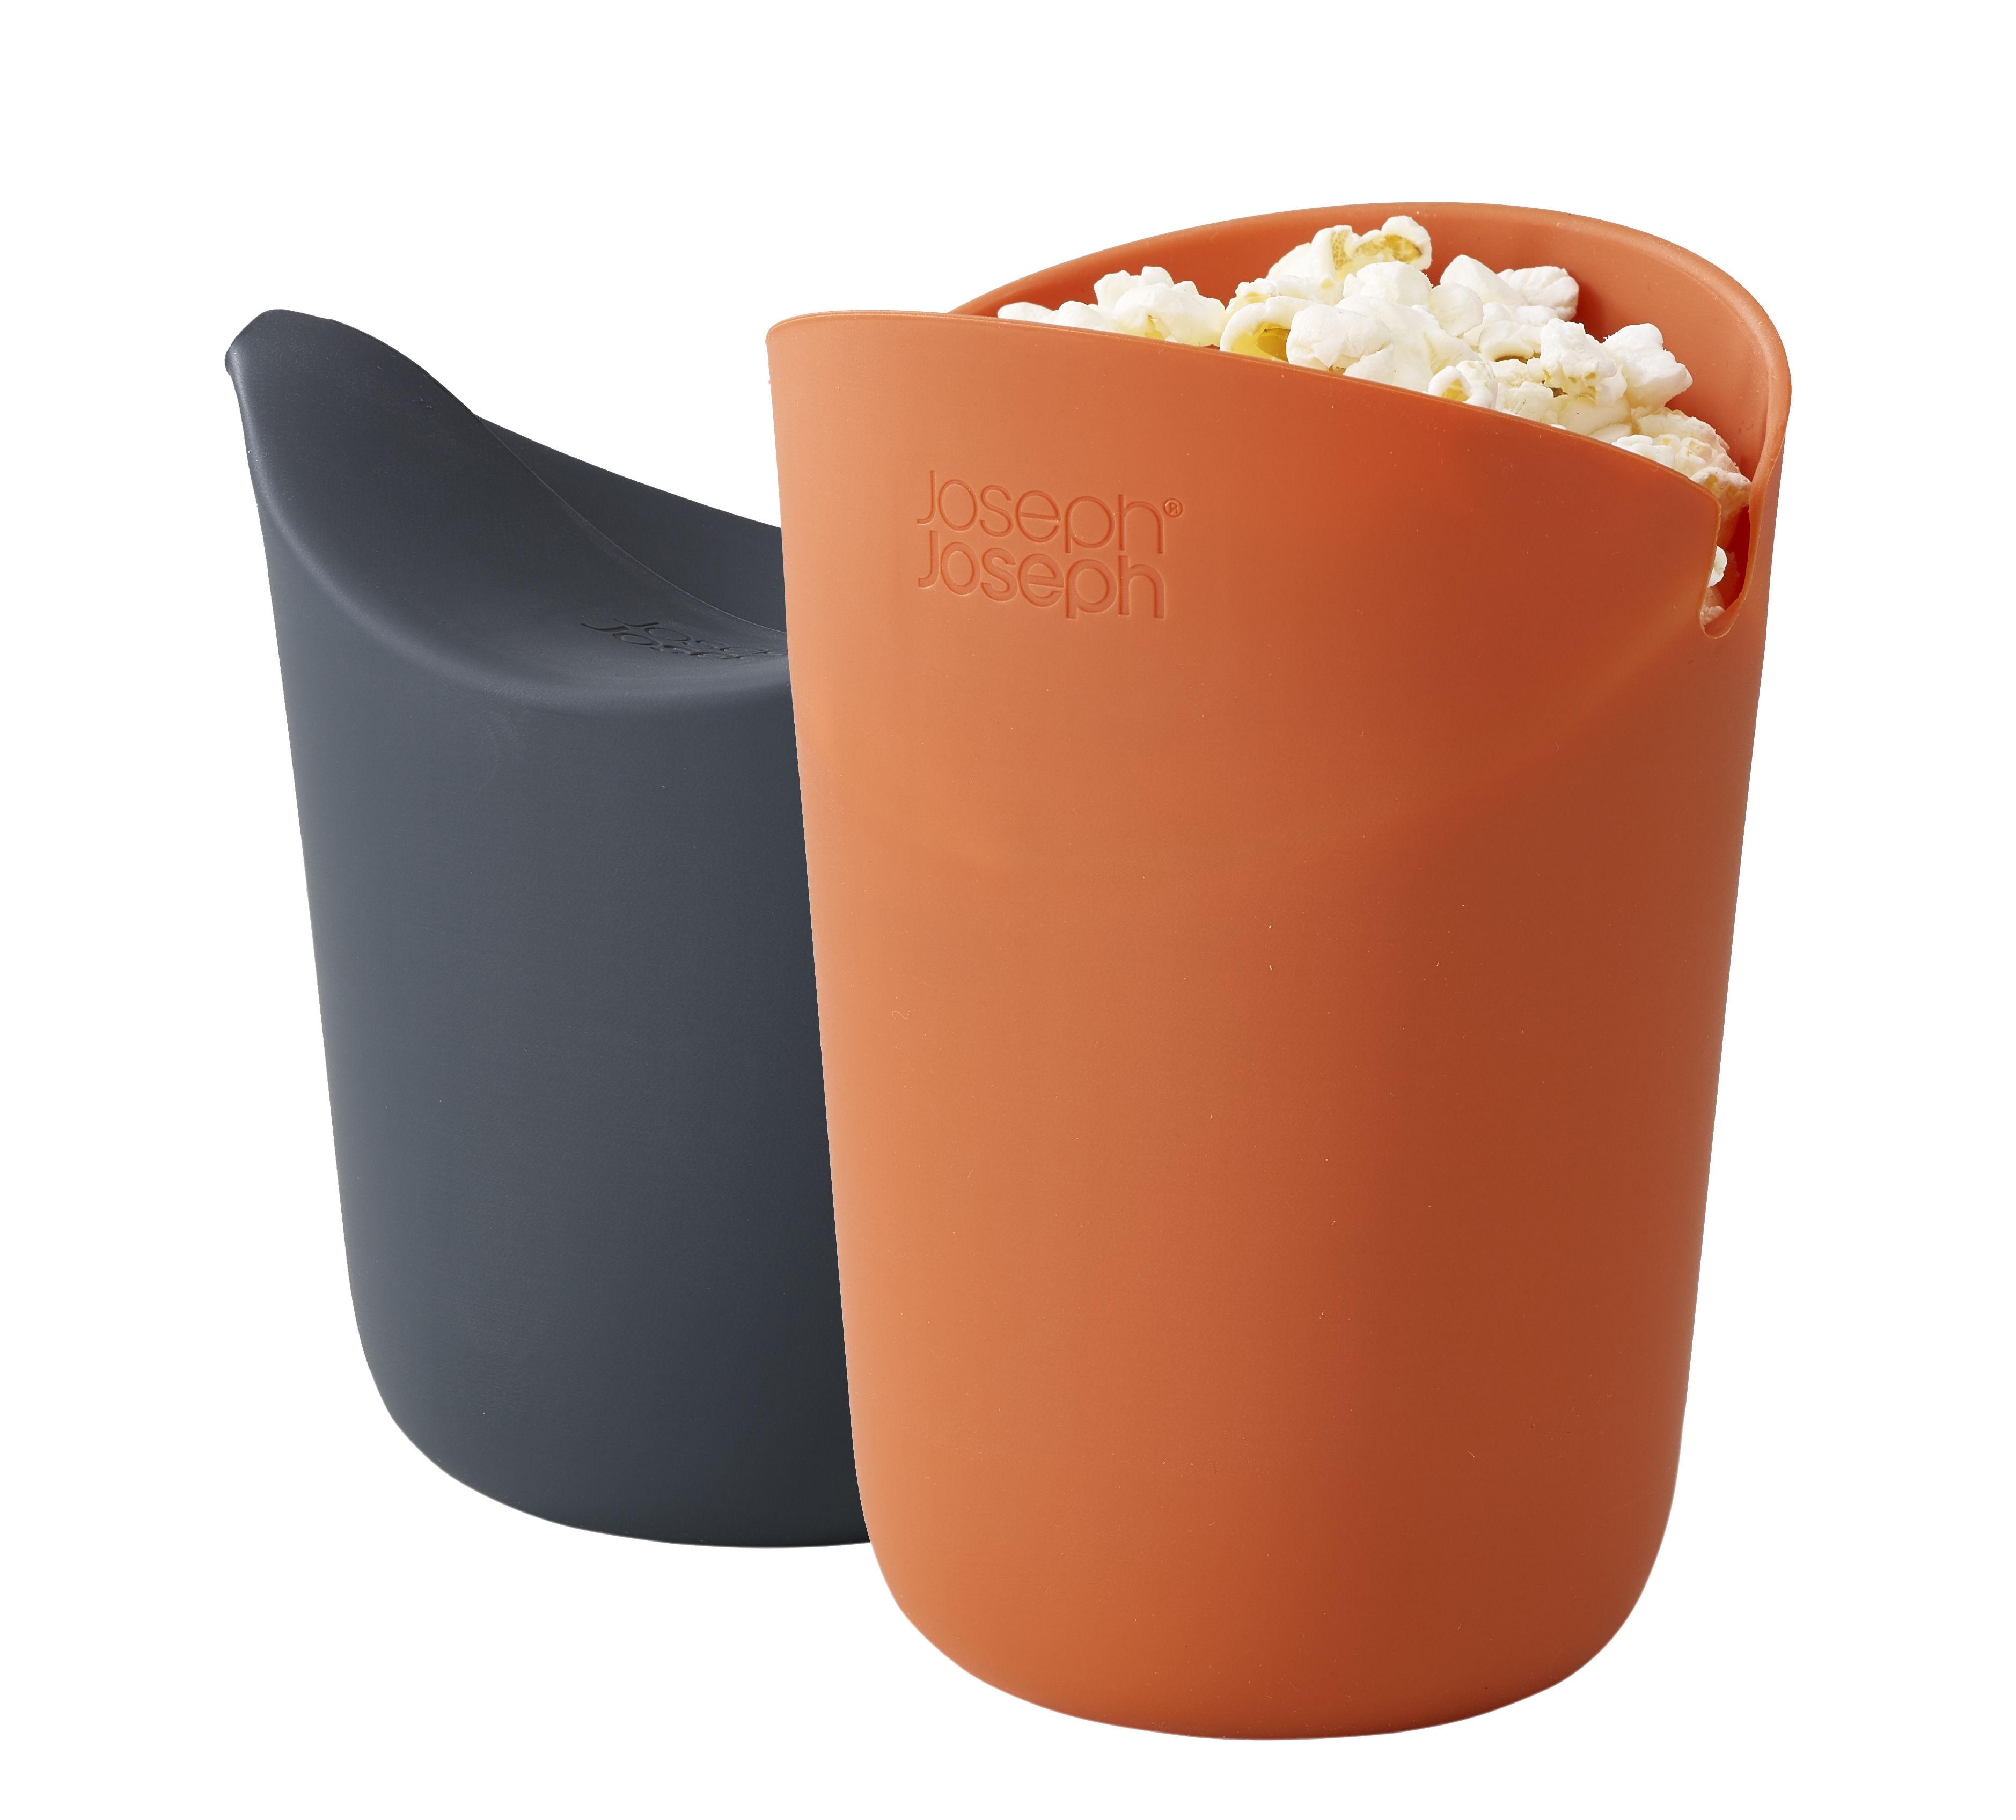 Kitchenware - Kitchen Equipment - M-Cuisine Popcorn Makers - Set of 2 by Joseph Joseph - Orange & Grey - Silicone